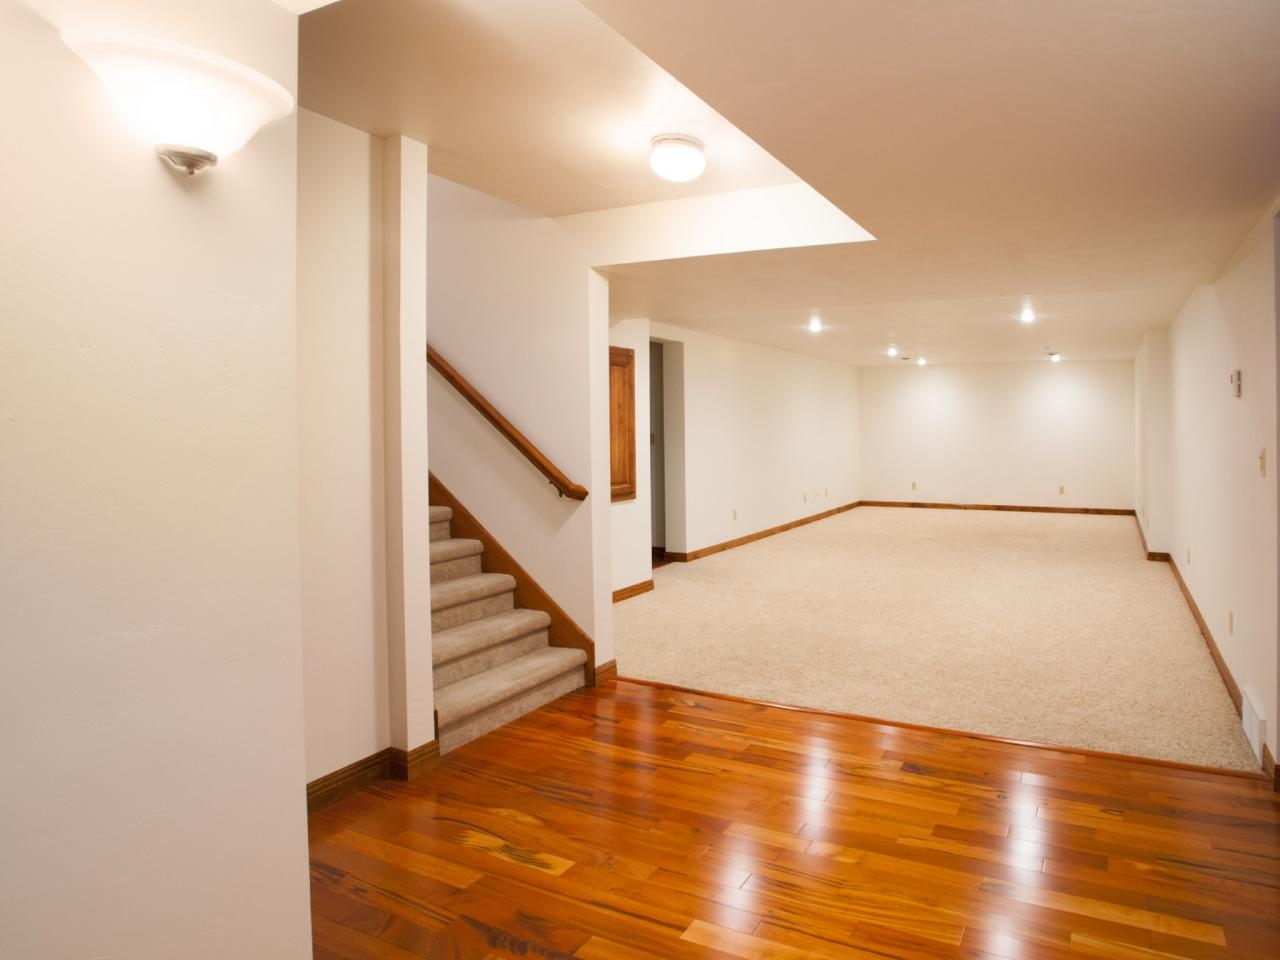 Best Flooring To Put On Concrete Basement Floor Best Flooring To Put On Concrete Basement Floor best basement flooring options diy 1280 X 960